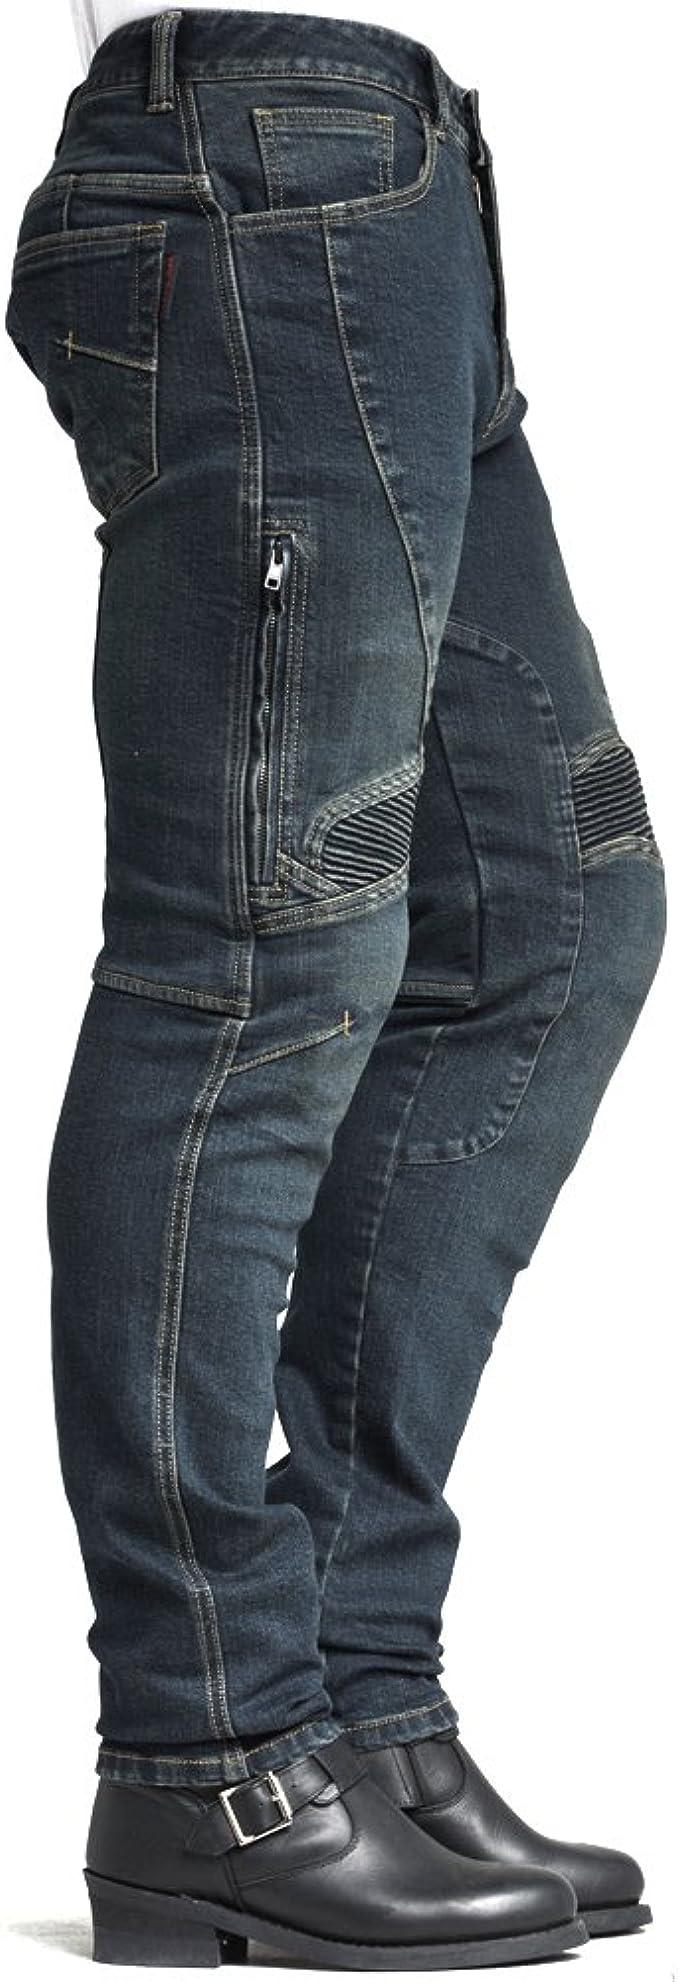 MAXLER JEAN Biker Jeans for men Motorcycle Motorbike riding kevlar Jeans 002 Blue 28